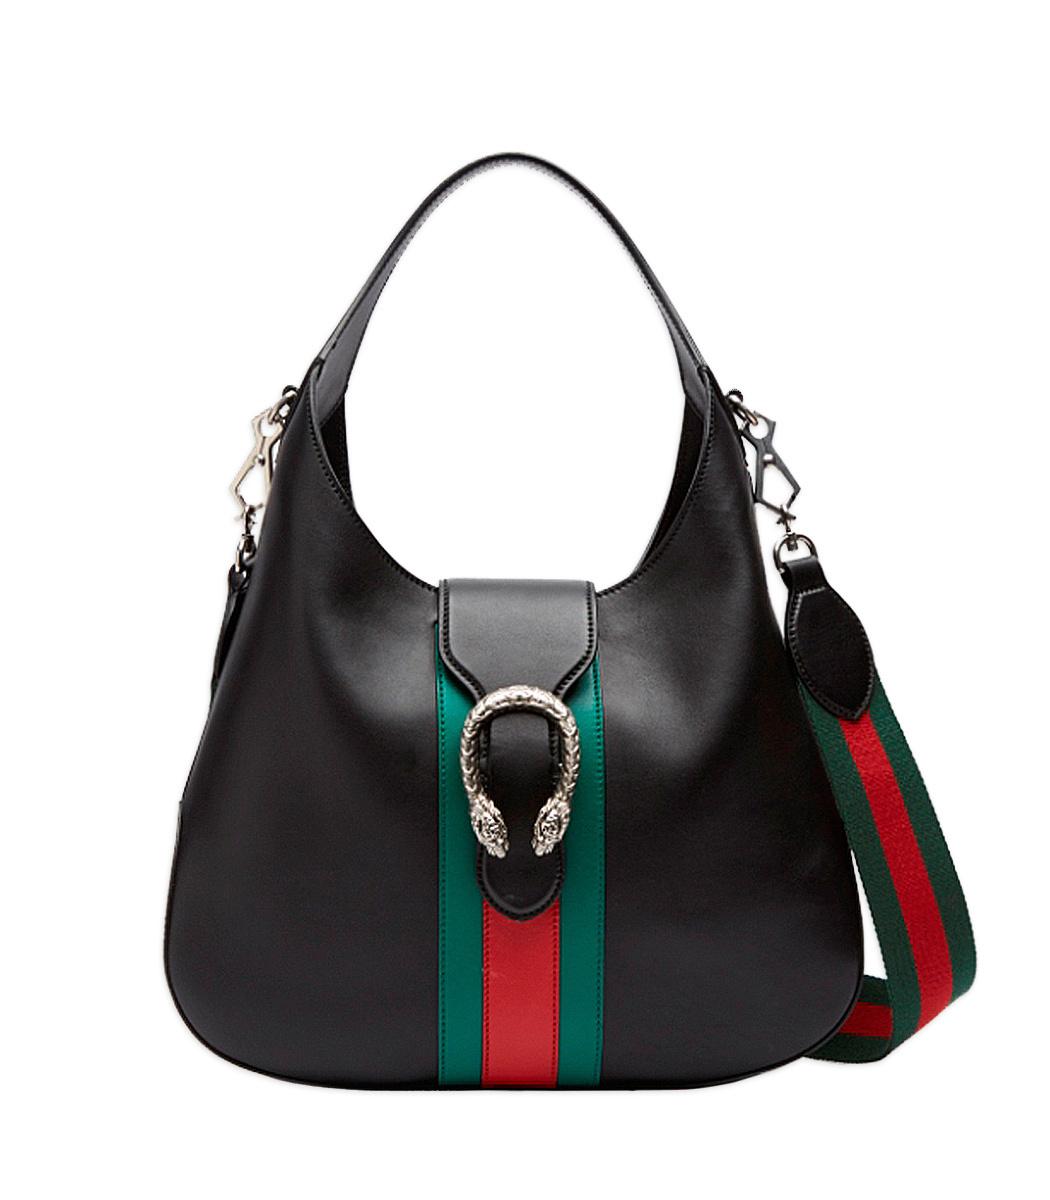 f3a2ed8b91c6 Gucci Dionysus Medium Web-Stripe Hobo Bag, Black | ModeSens